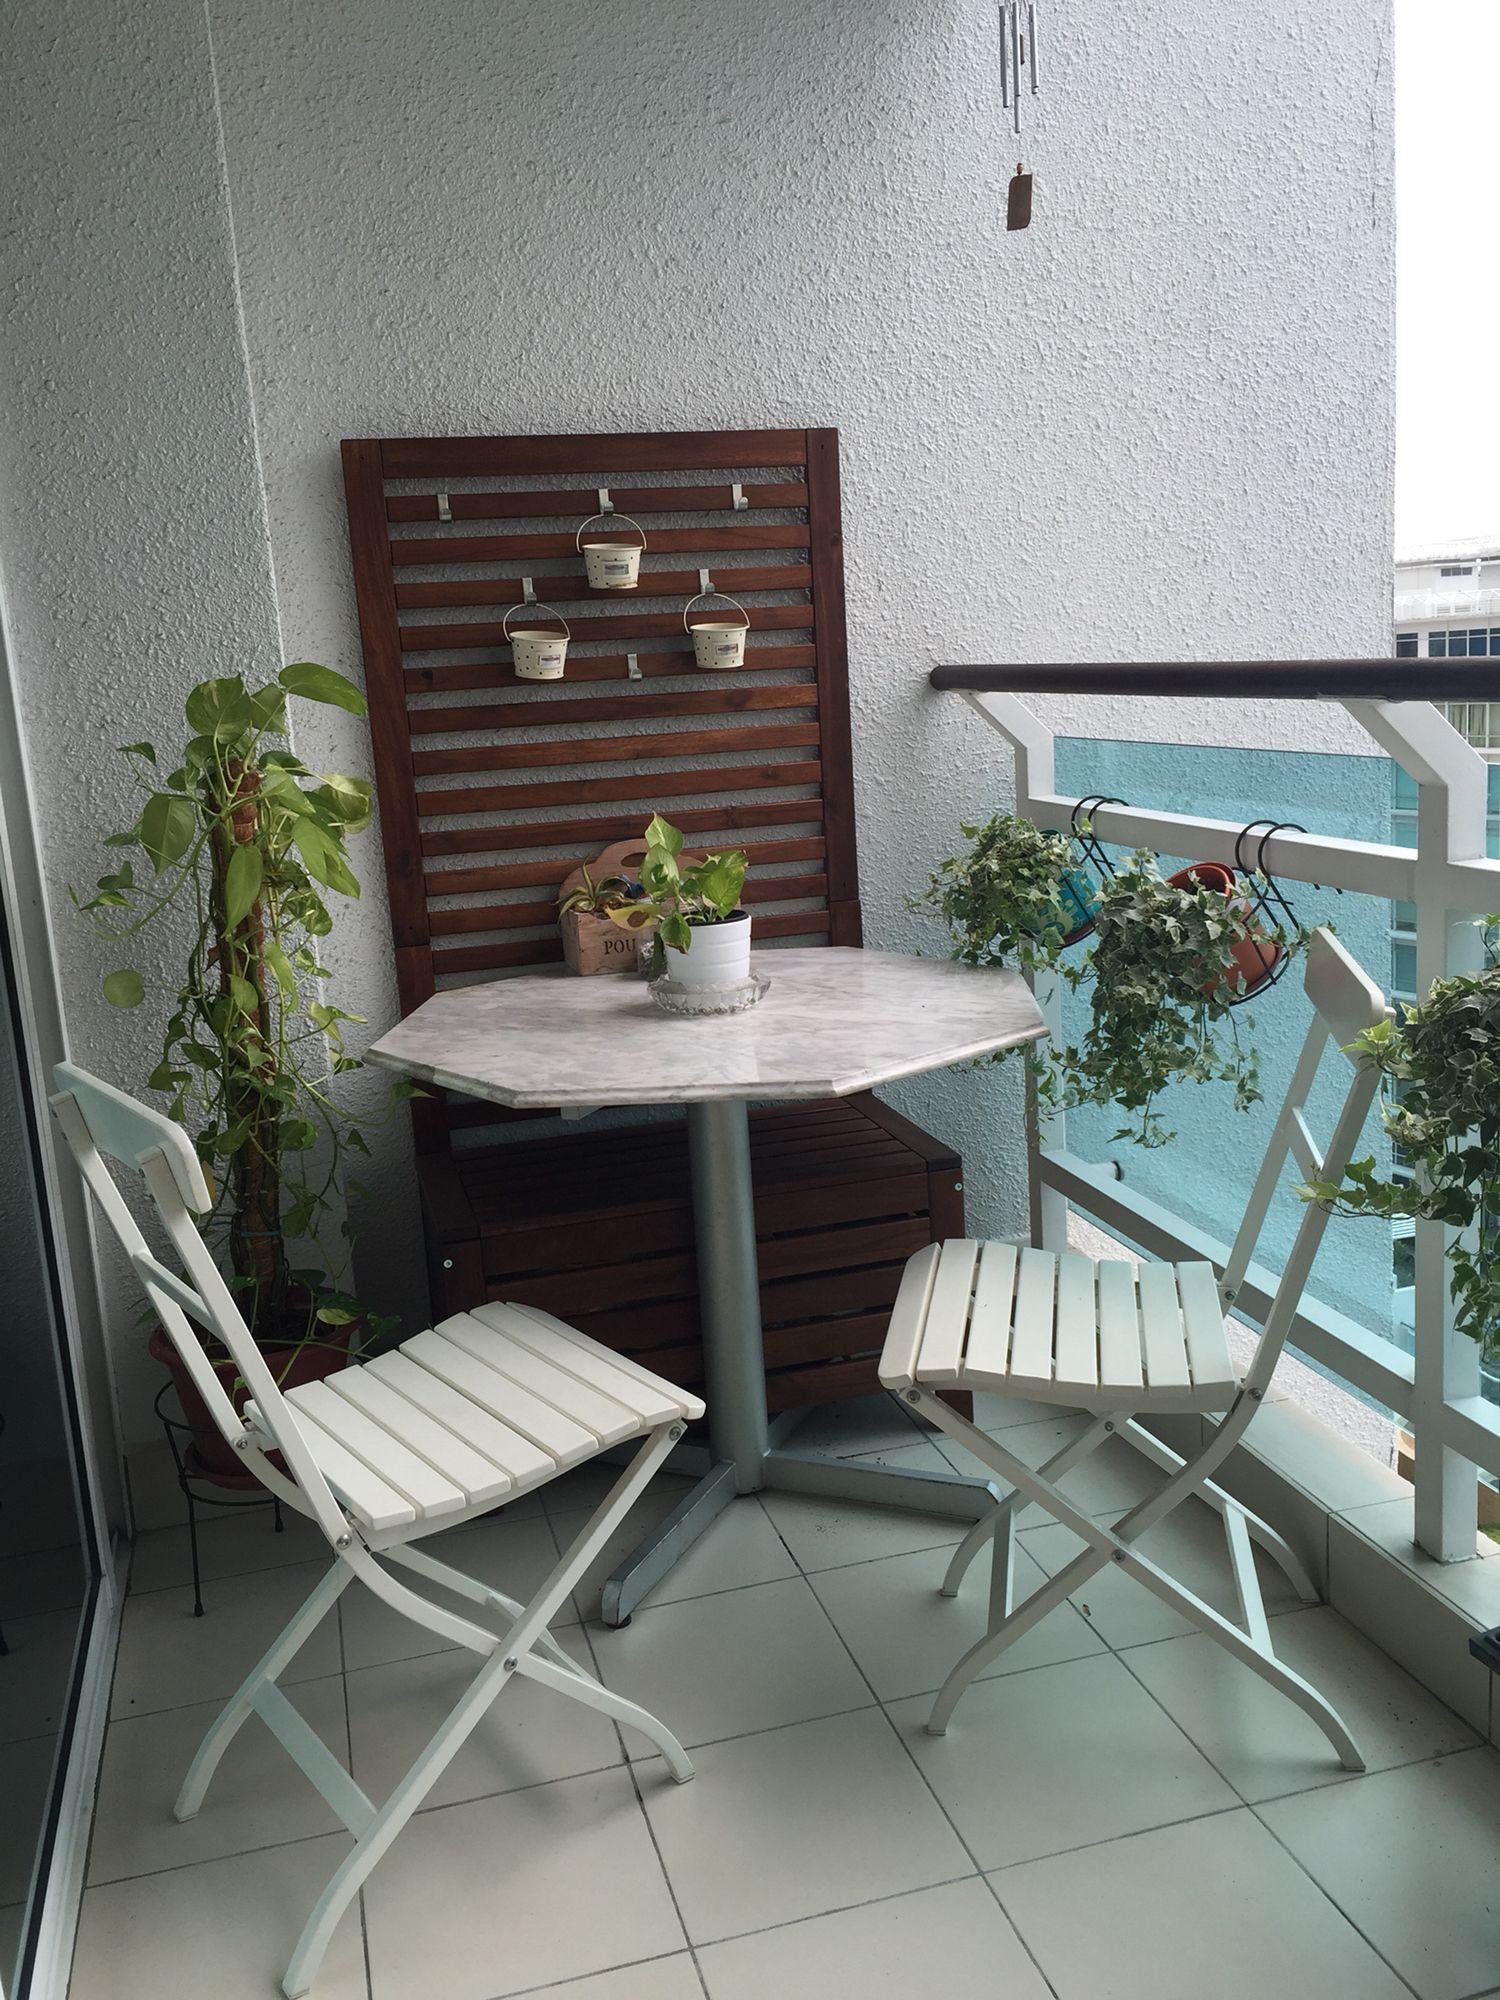 Ikea Applaro Bench And Wall Panel Malaro Chairs